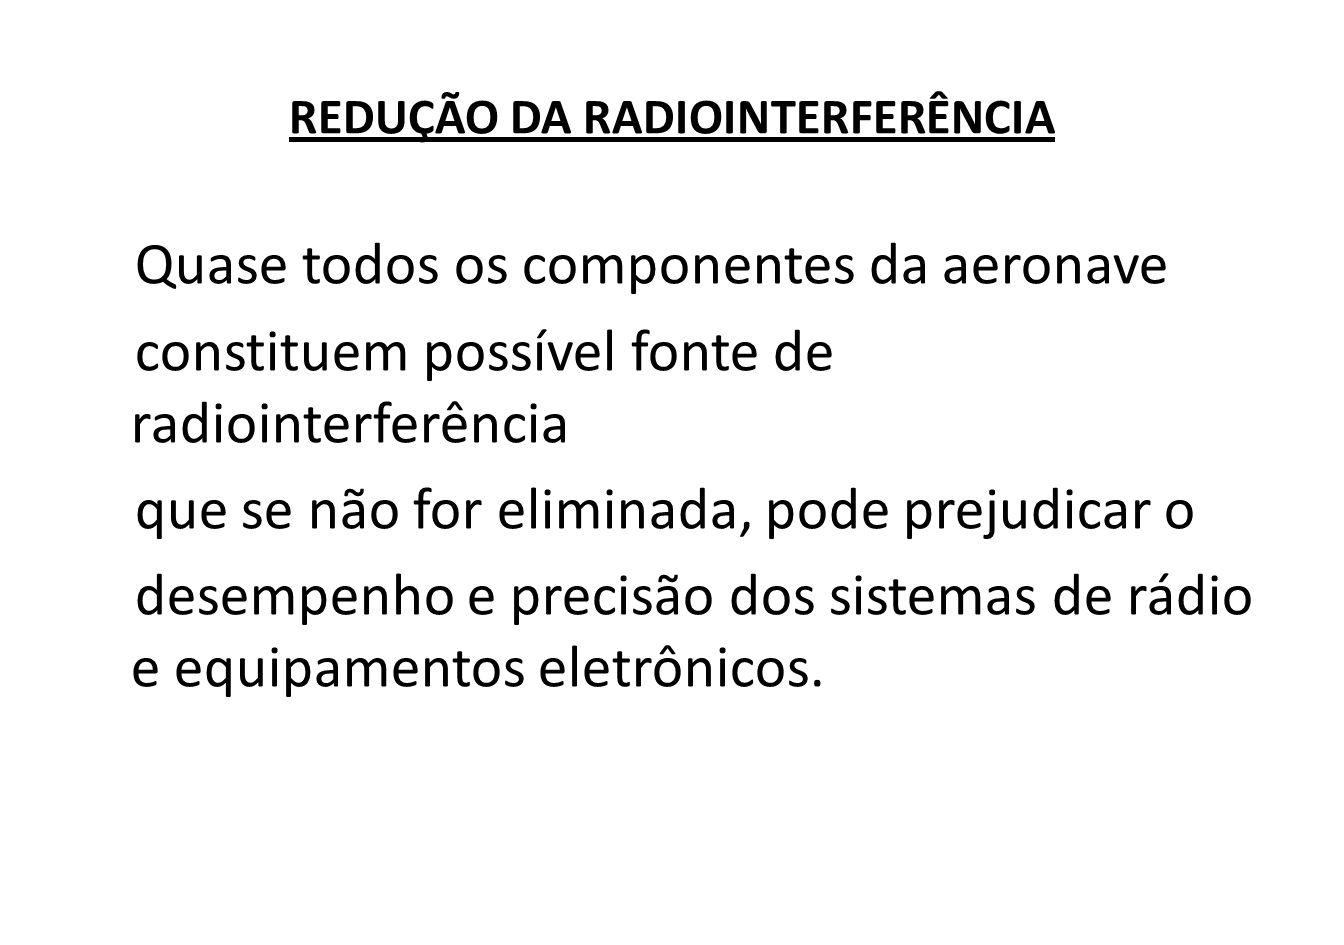 REDUÇÃO DA RADIOINTERFERÊNCIA